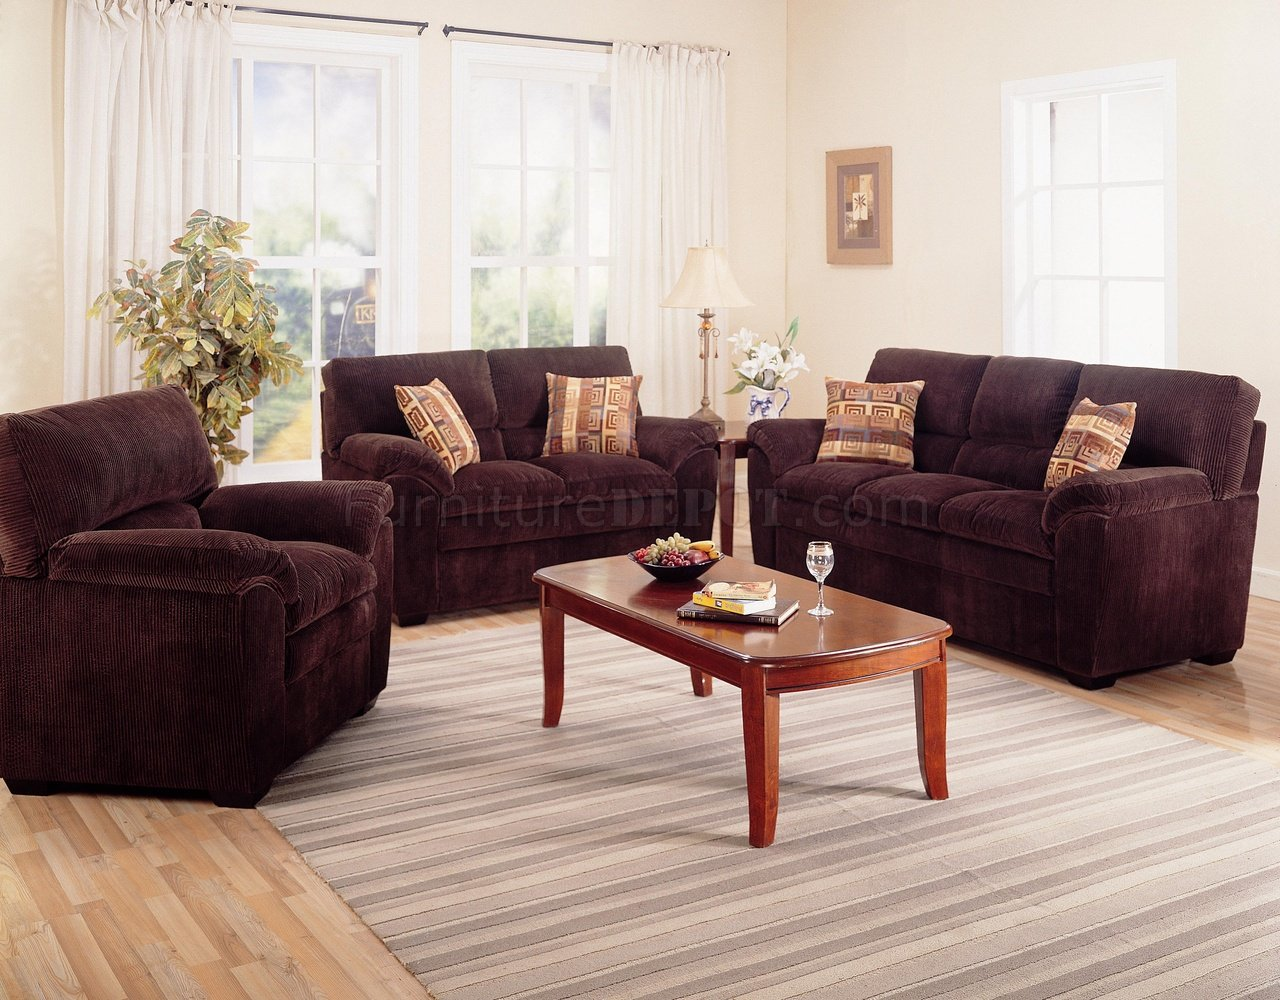 modern living room couches log home decorating ideas corduroy fabric 502521 dark chocolate sofa w options